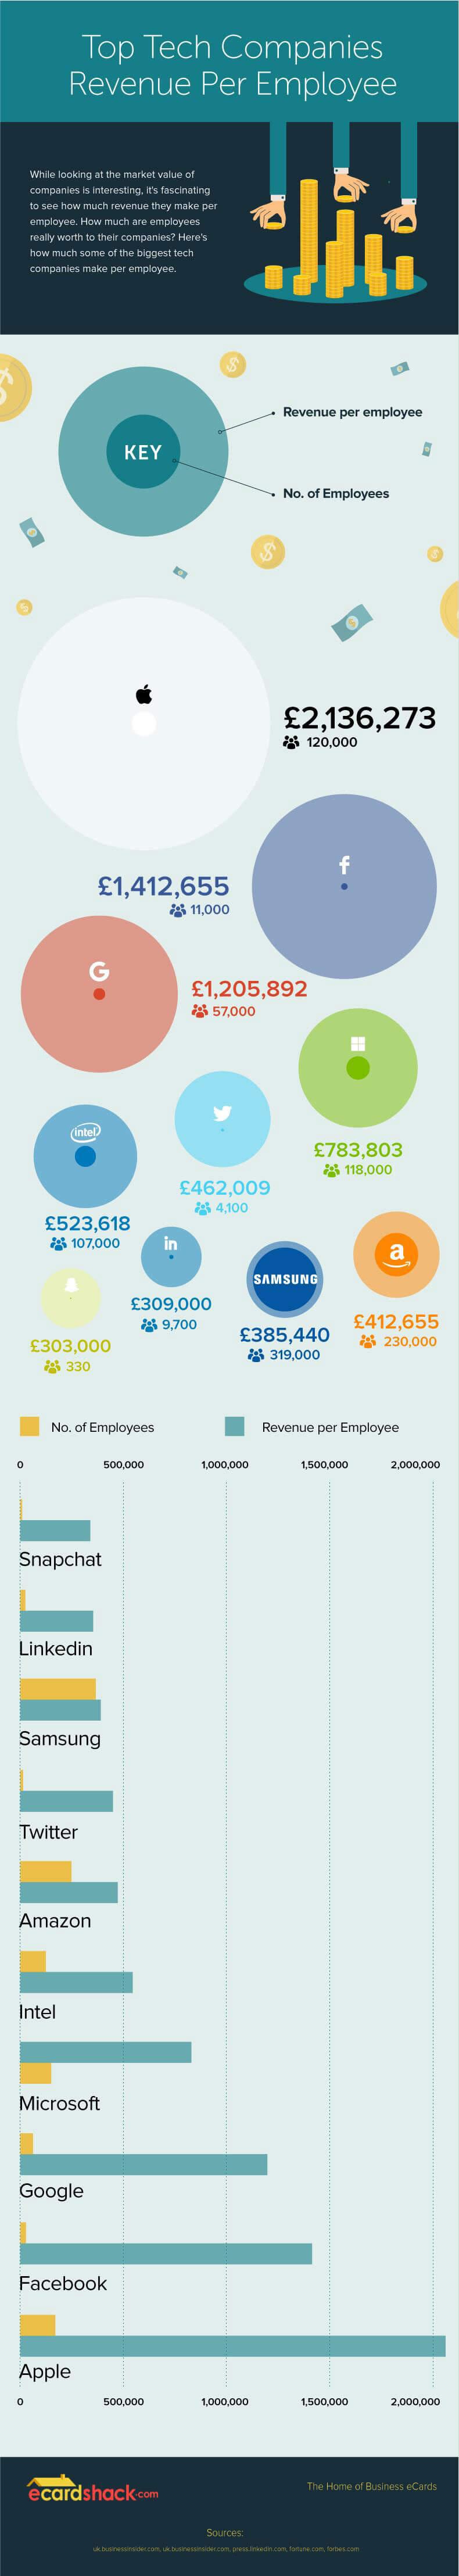 Infographic: Top Tech Companies Revenue Per Employee Revealed